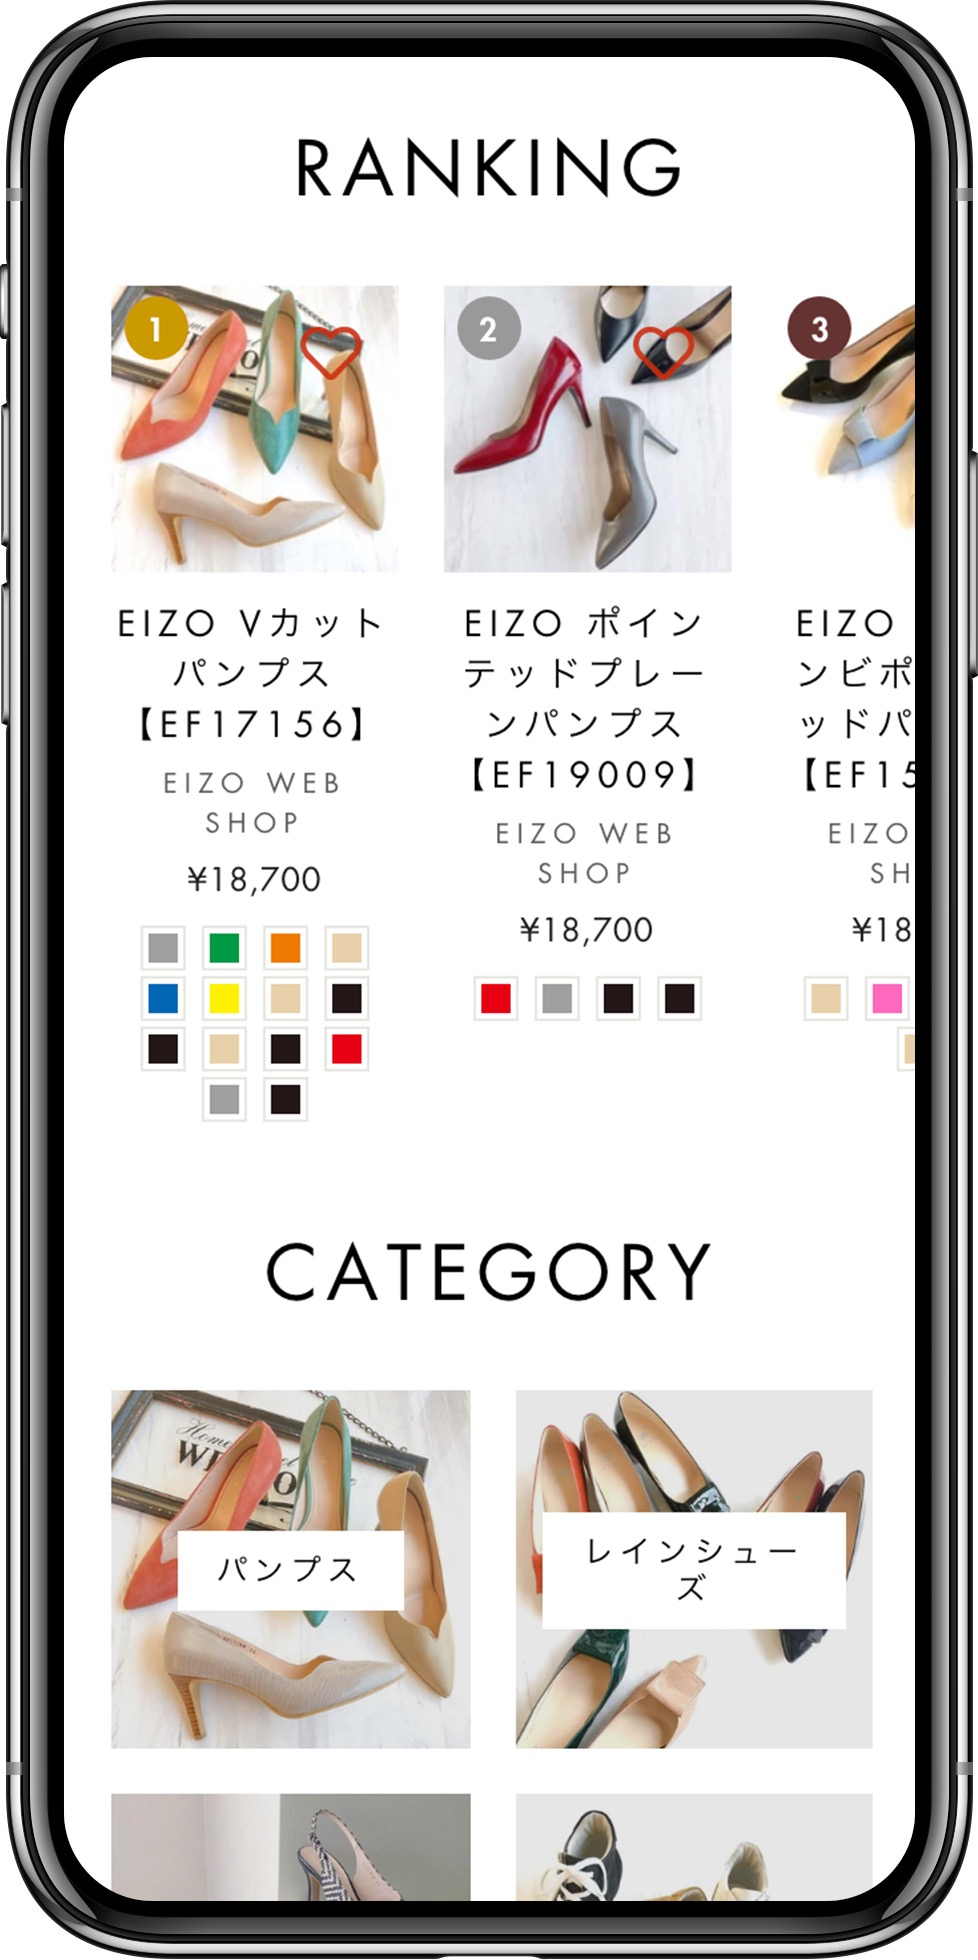 https://artpeace.jp/wp-content/uploads/2021/04/flame_sample-9.png